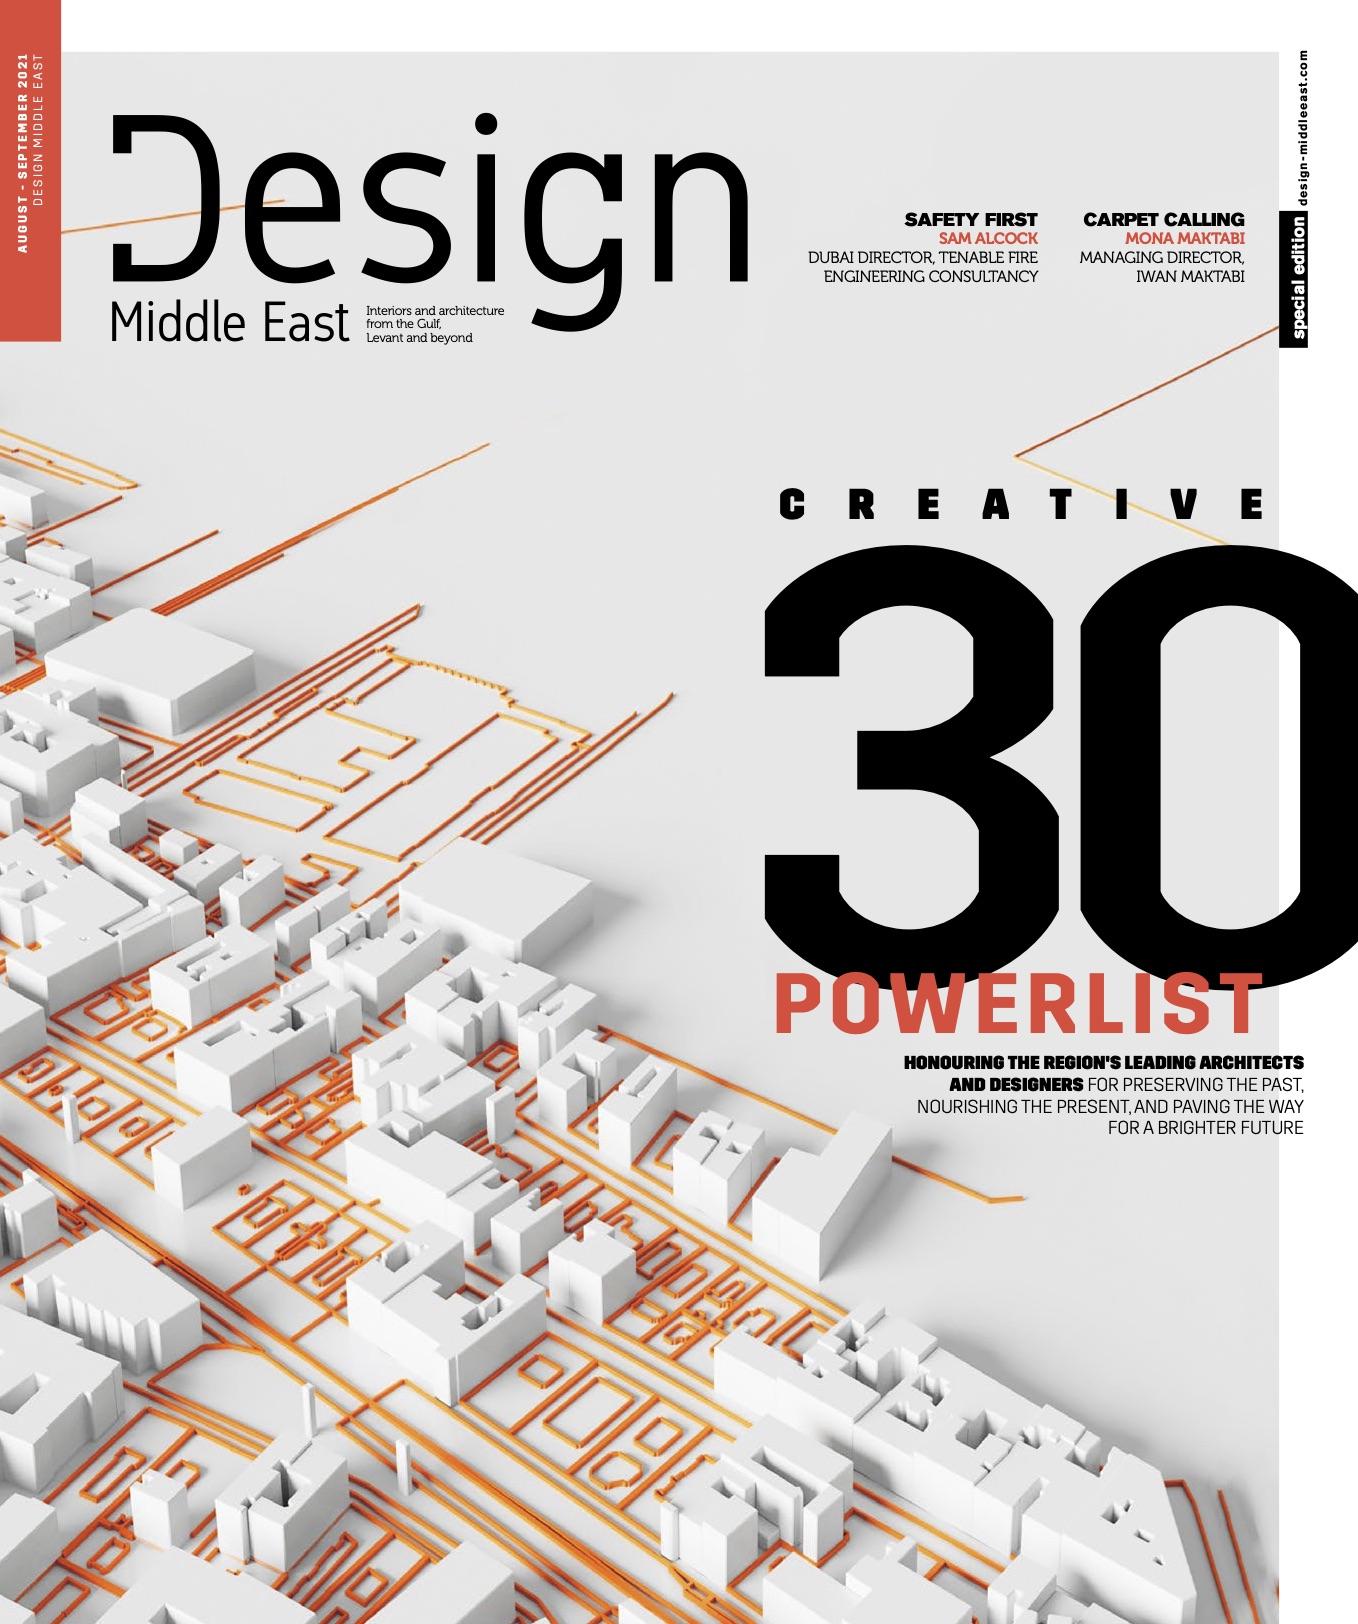 https://www.cbnme.com/magazines/design-me-august-september-2021/